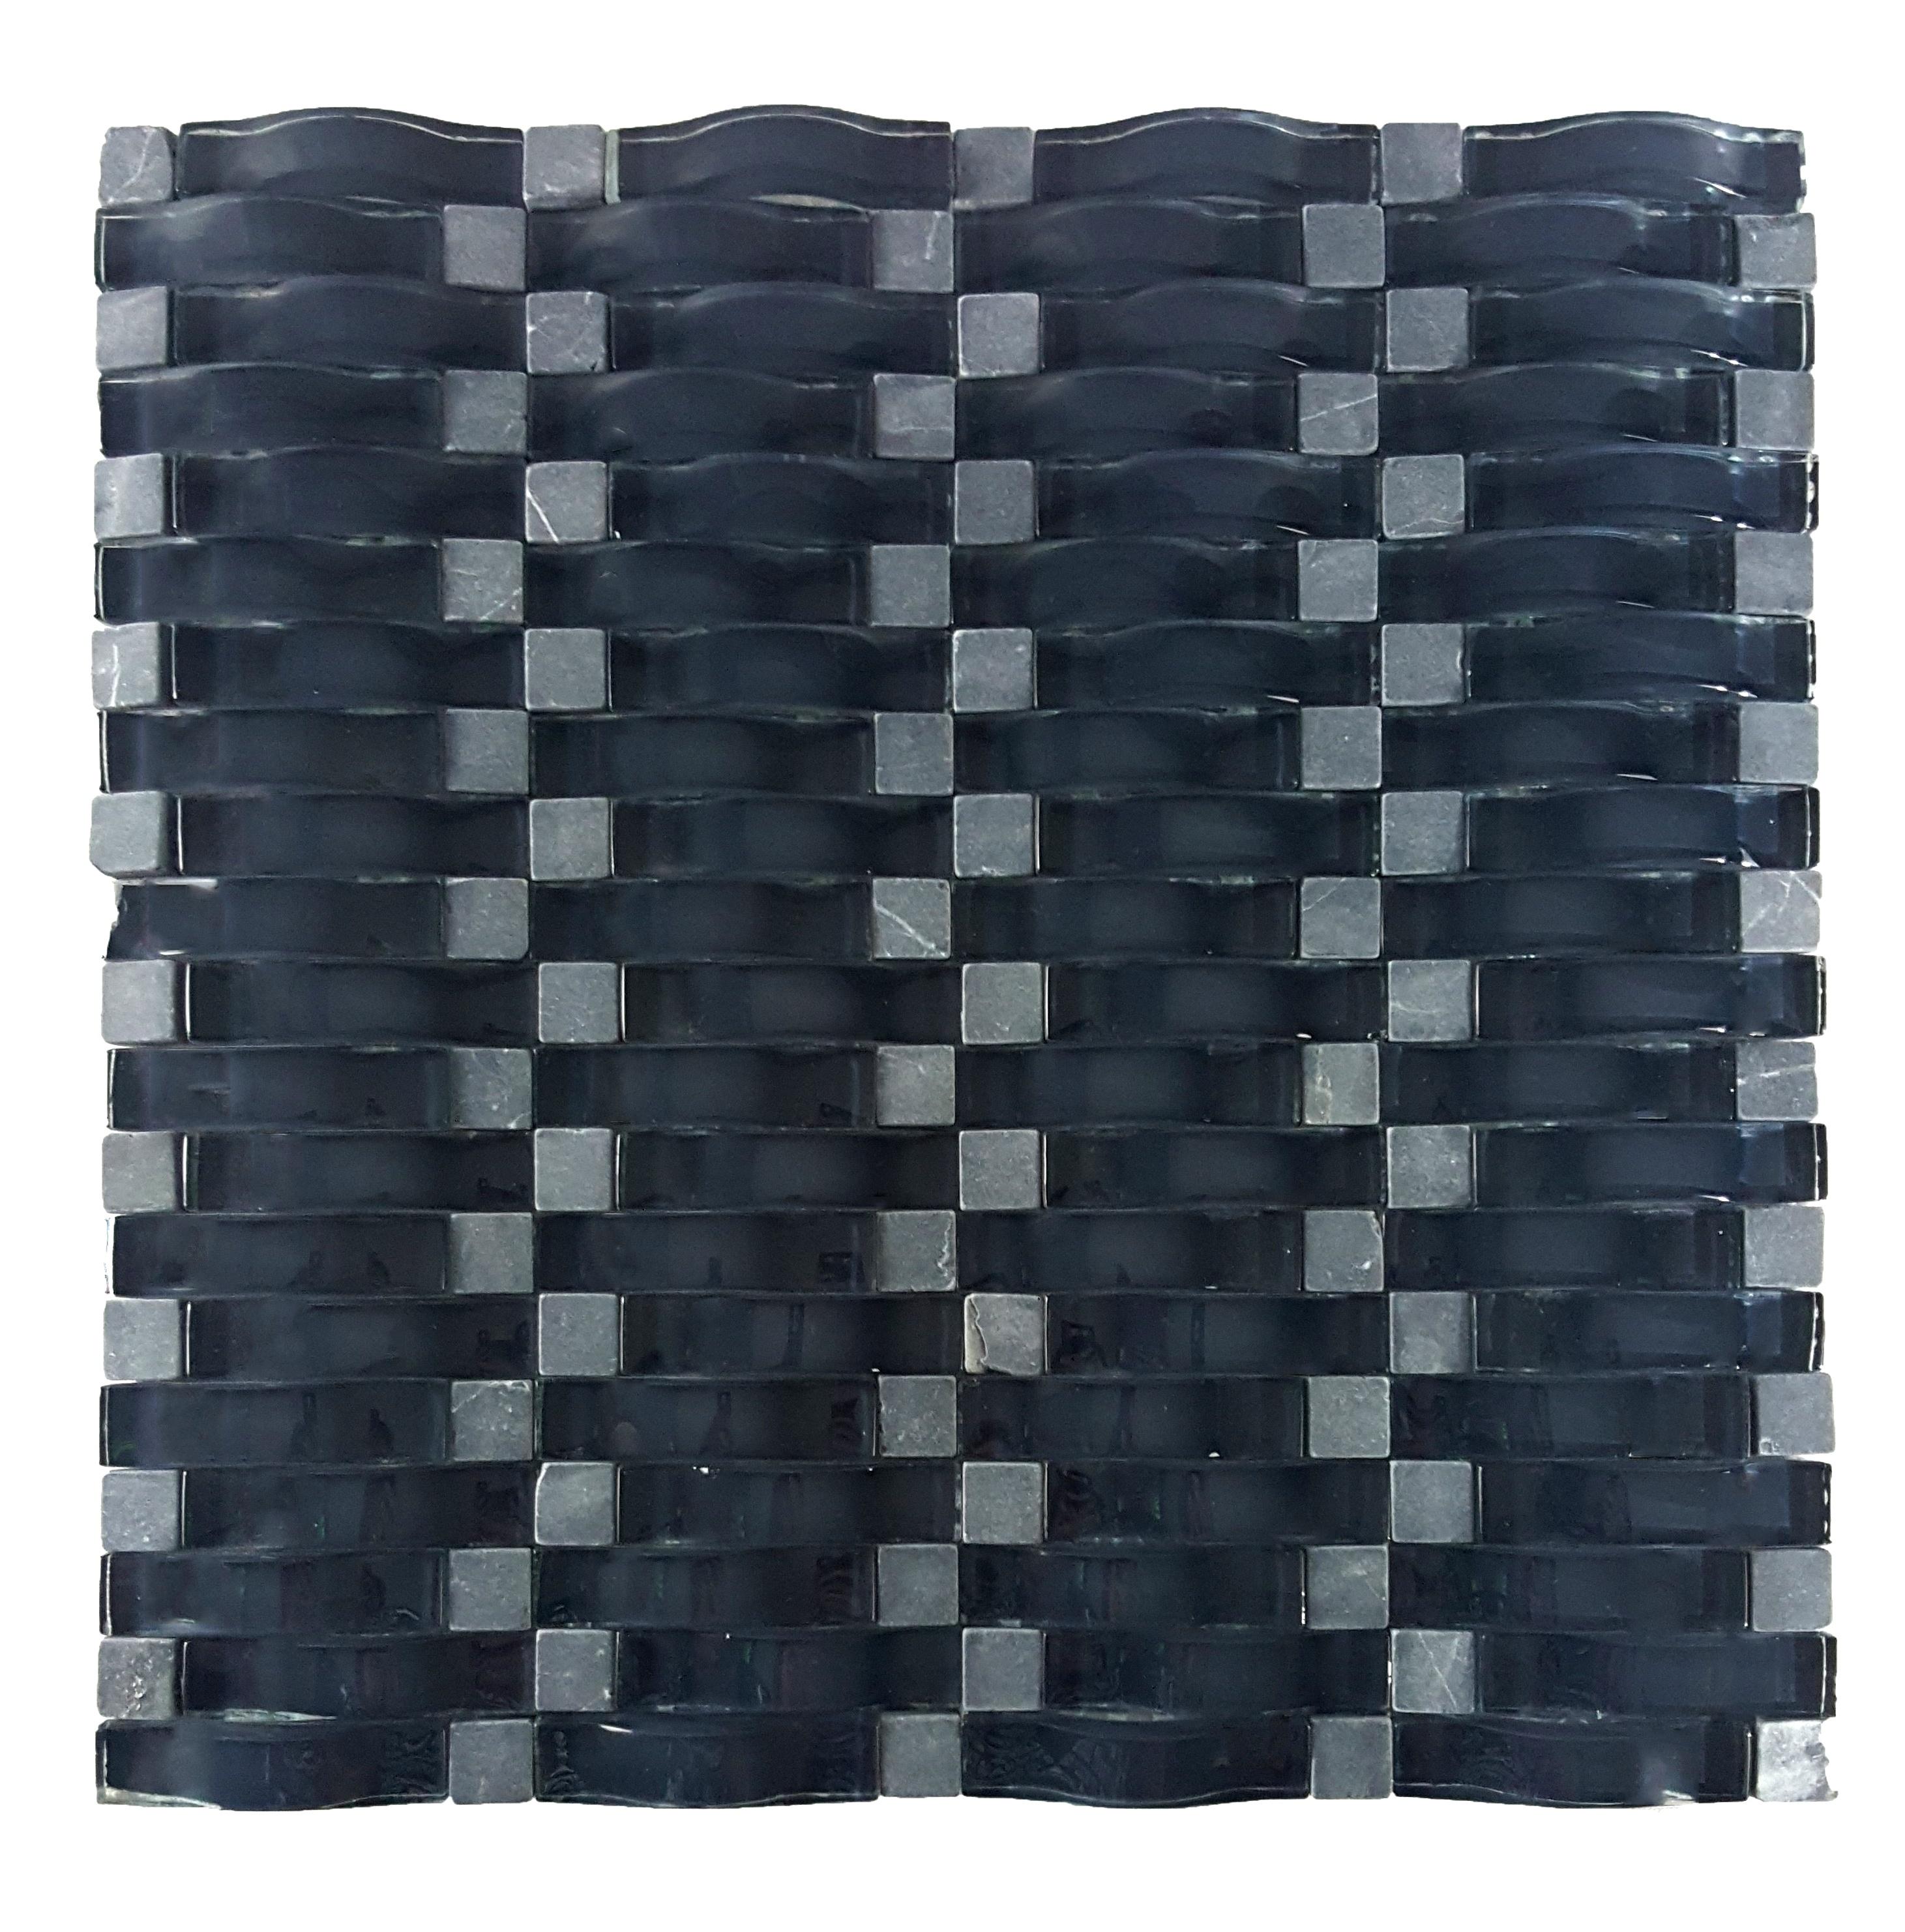 "Wave 0.63"" x 2.5"" Multi Finish Blue Glass 3D Backsplash Mosaic Wall Tile"